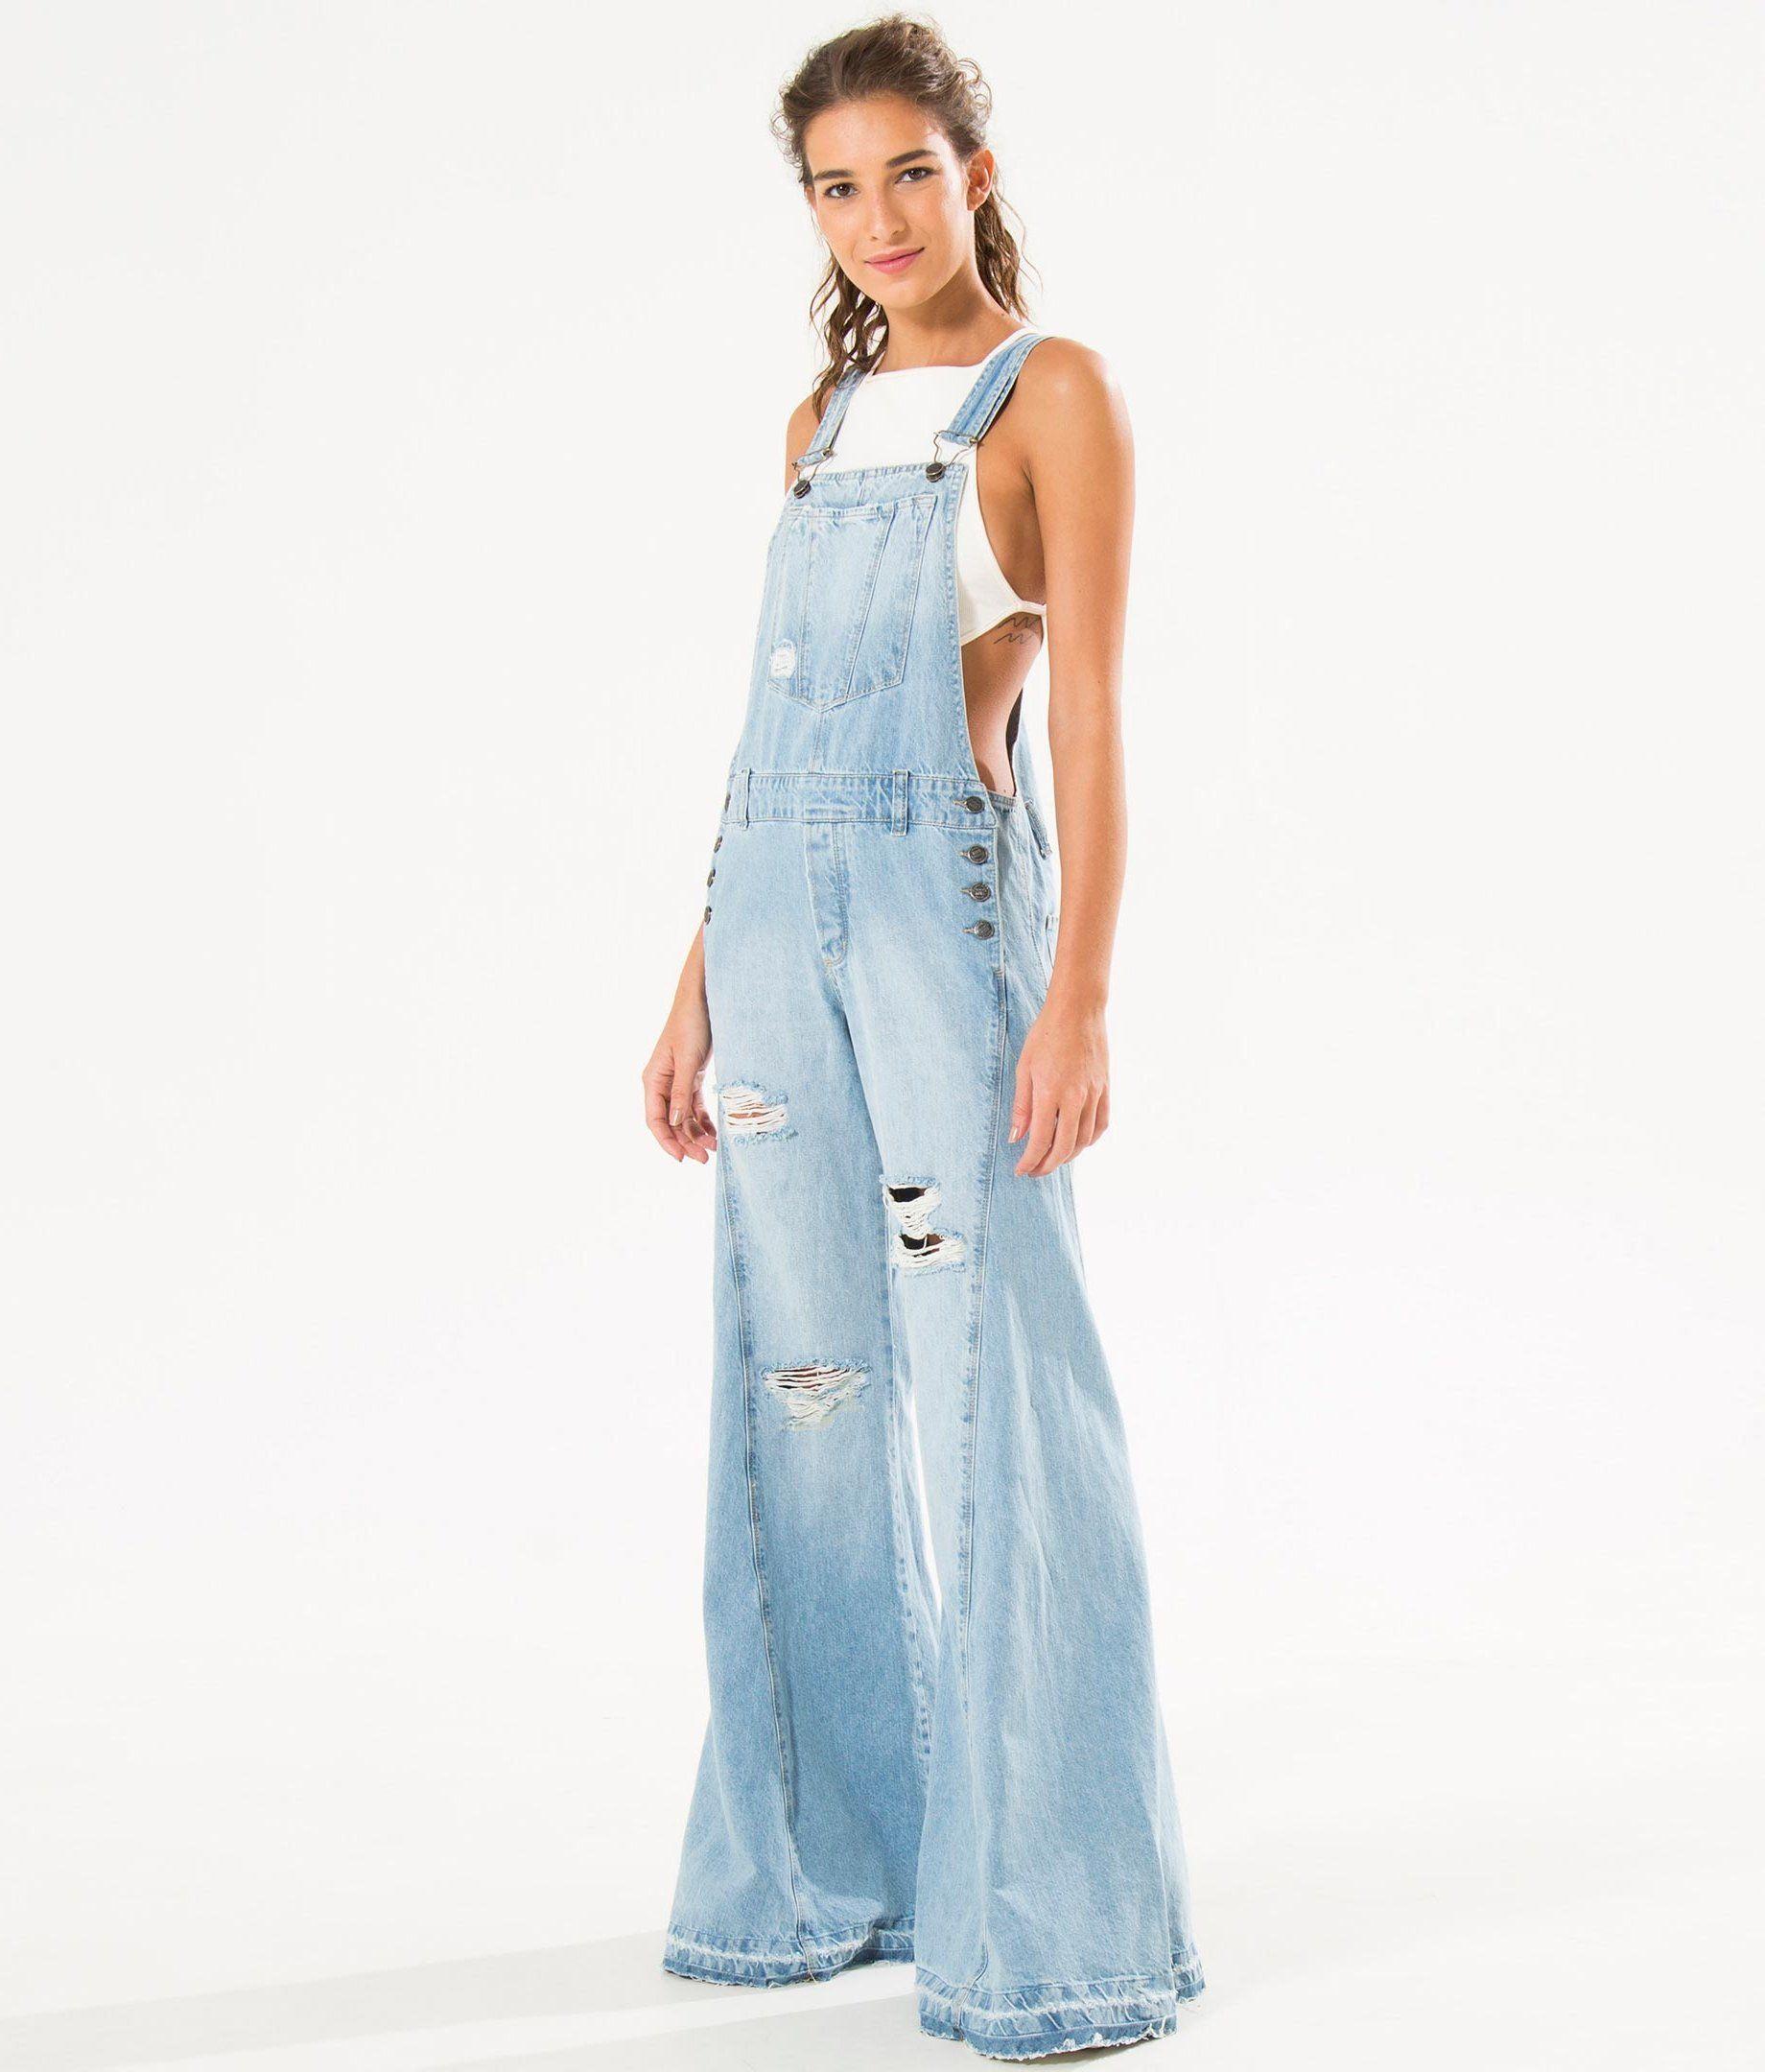 3a443f1aa jardineira jeans detonada | dreamy jeany in 2019 | Jardineira jeans ...